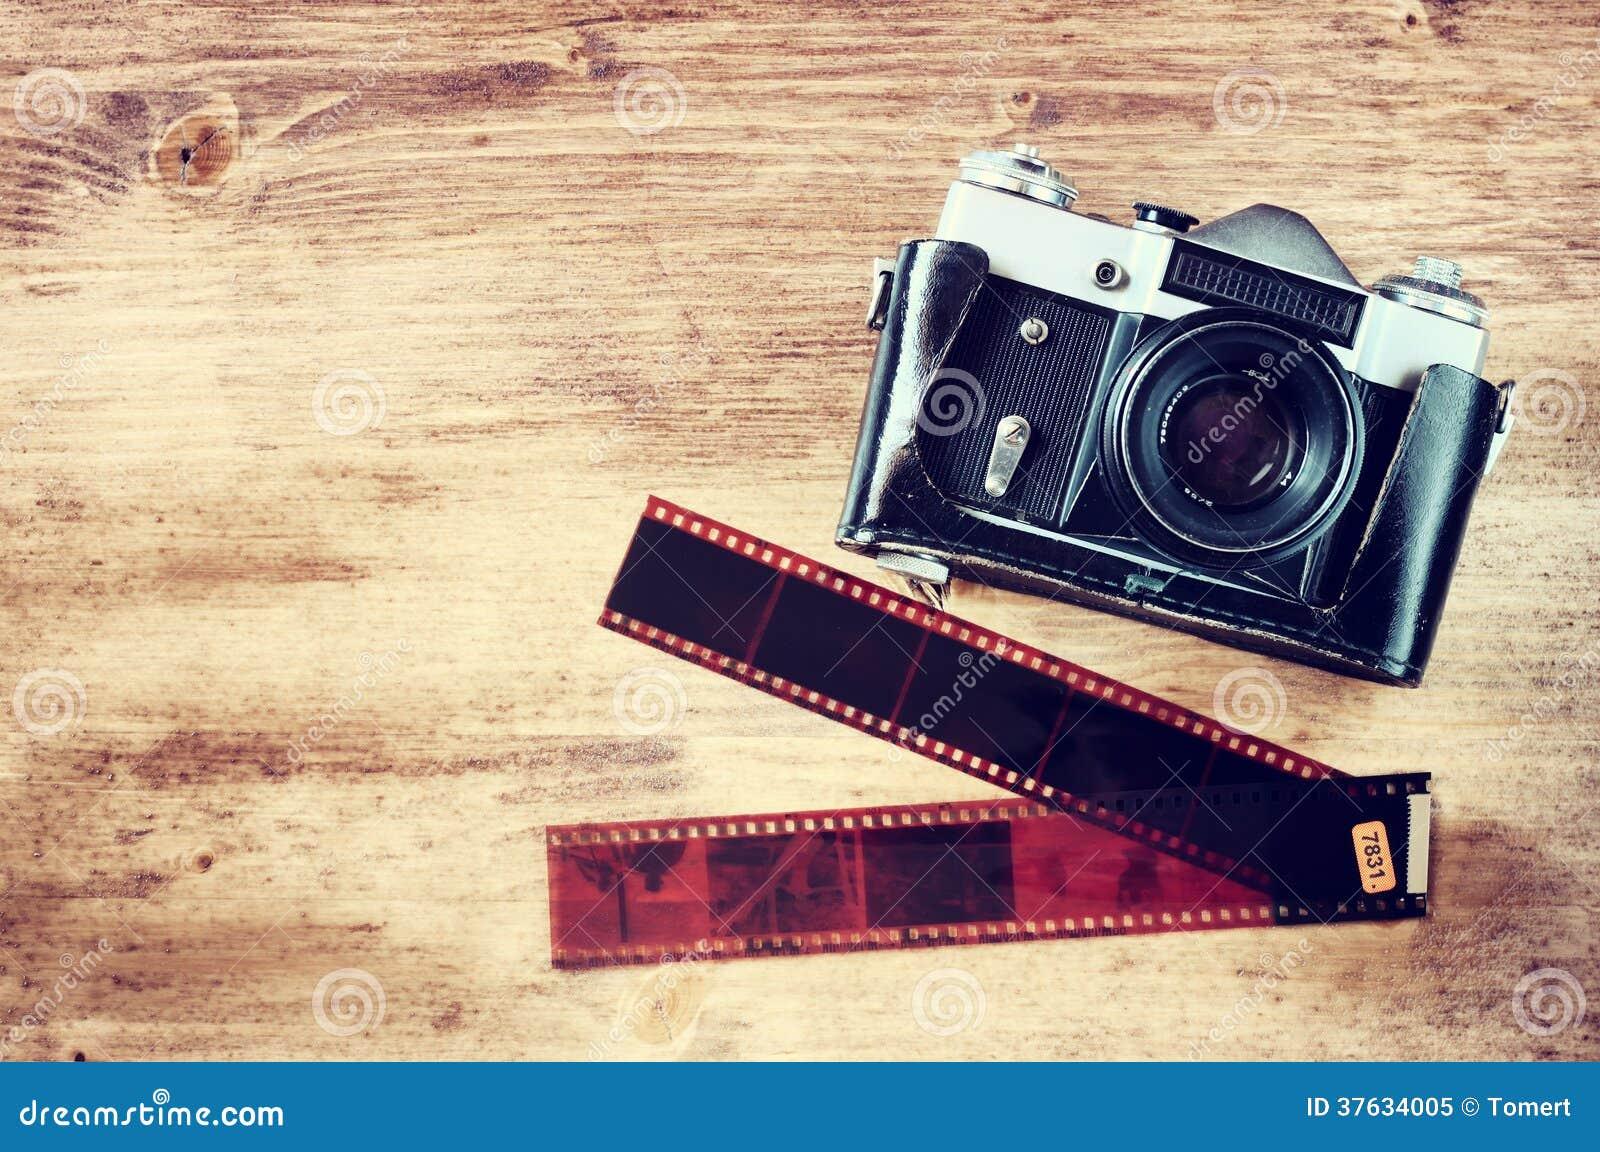 Vintage Camera Background Tumblr